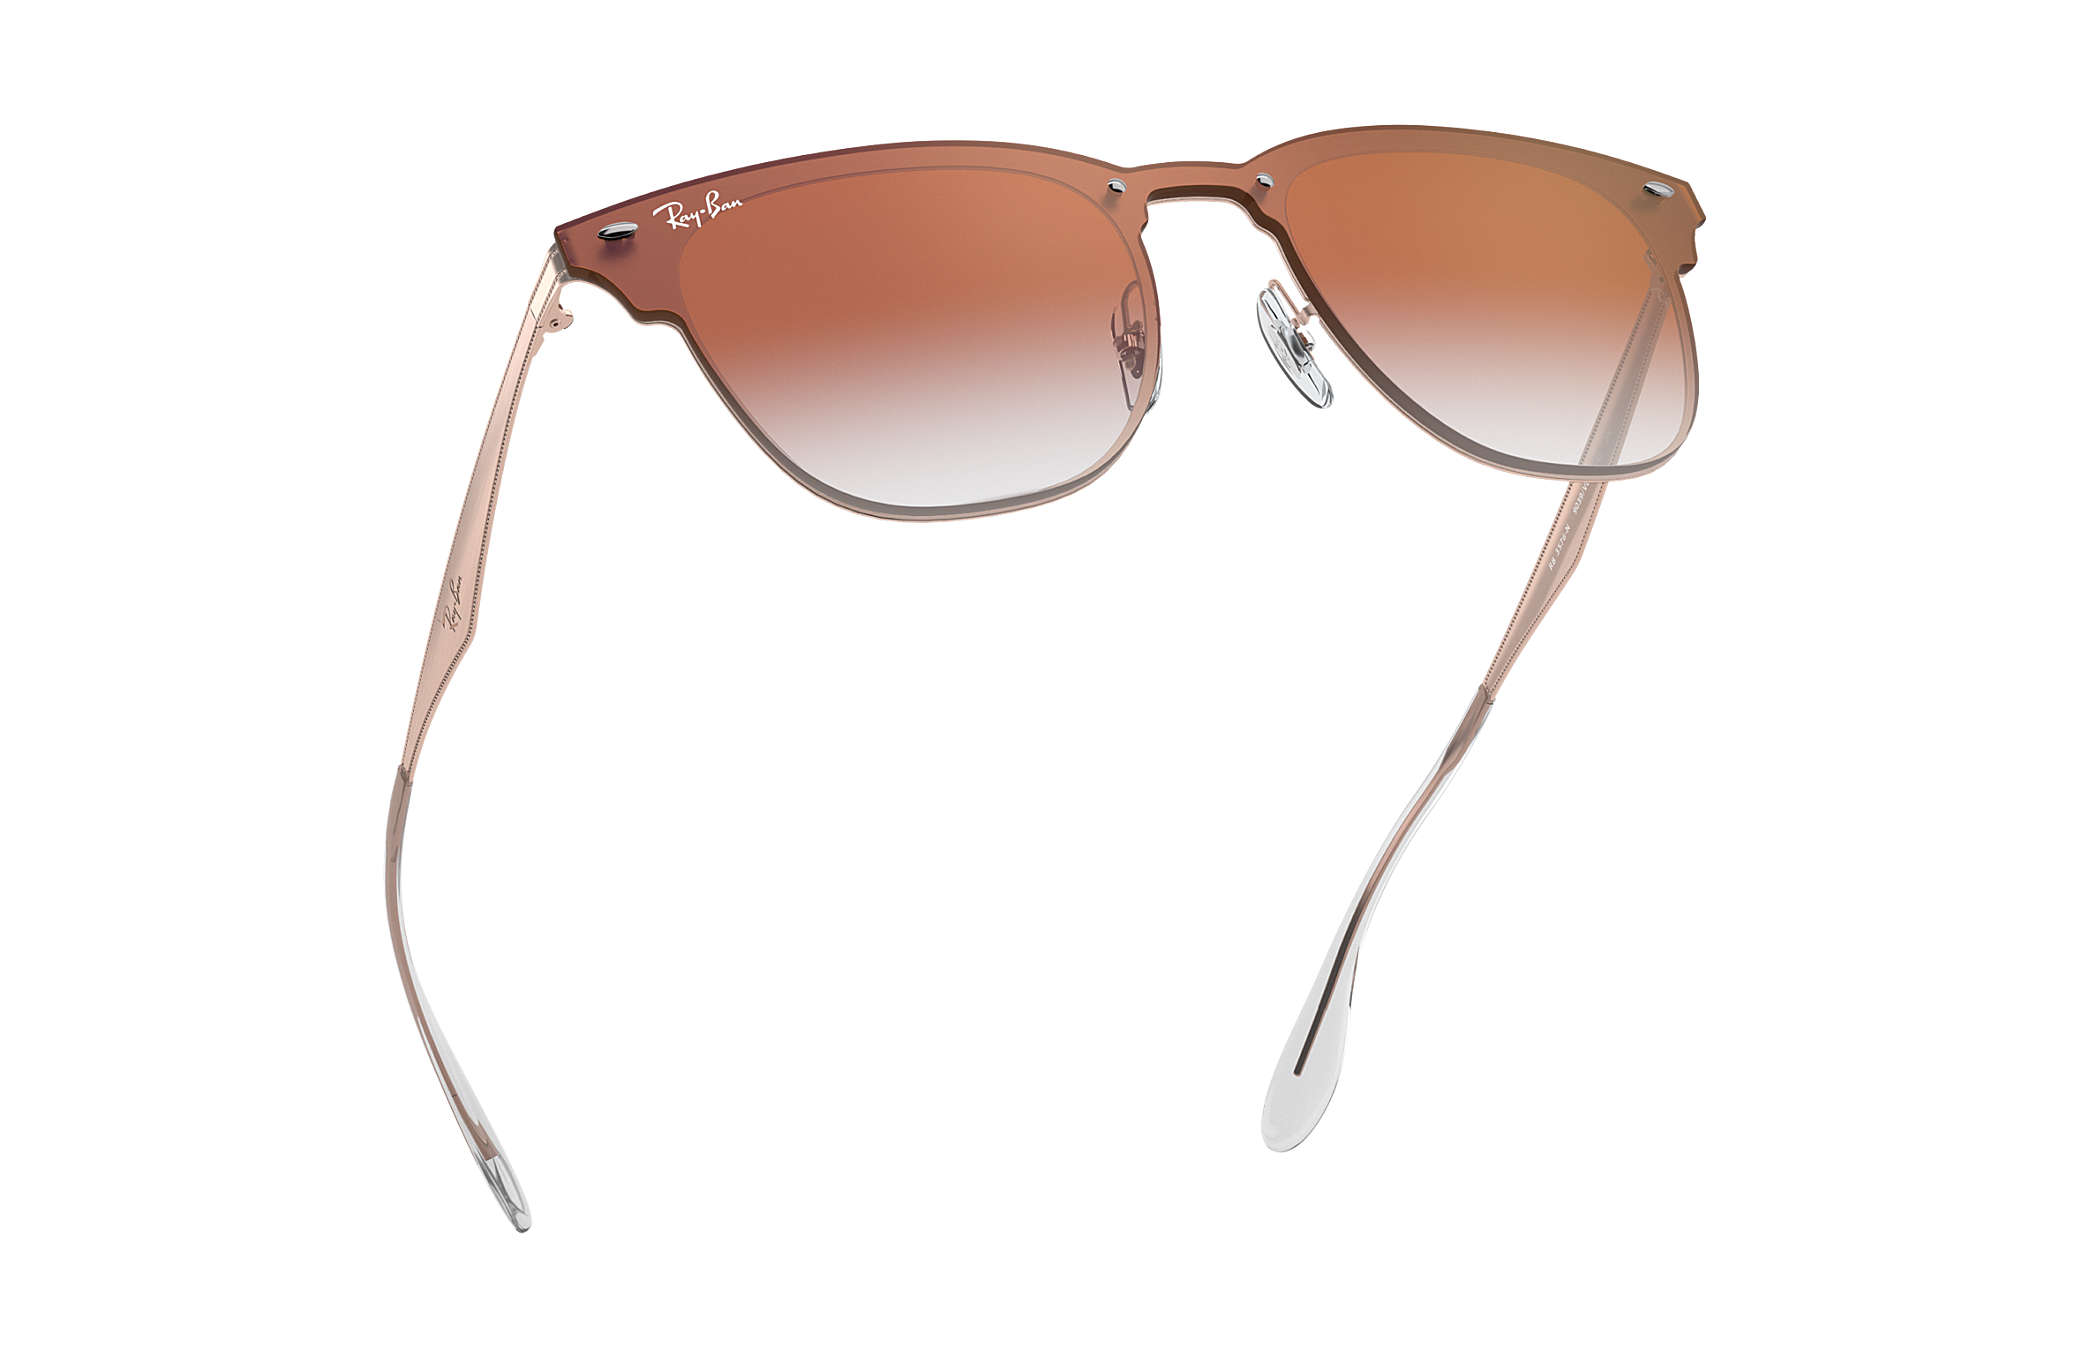 5cd17b37a8142 ... official ray ban clubmaster aluminum bronze sunglasses 5b58c 7a23f